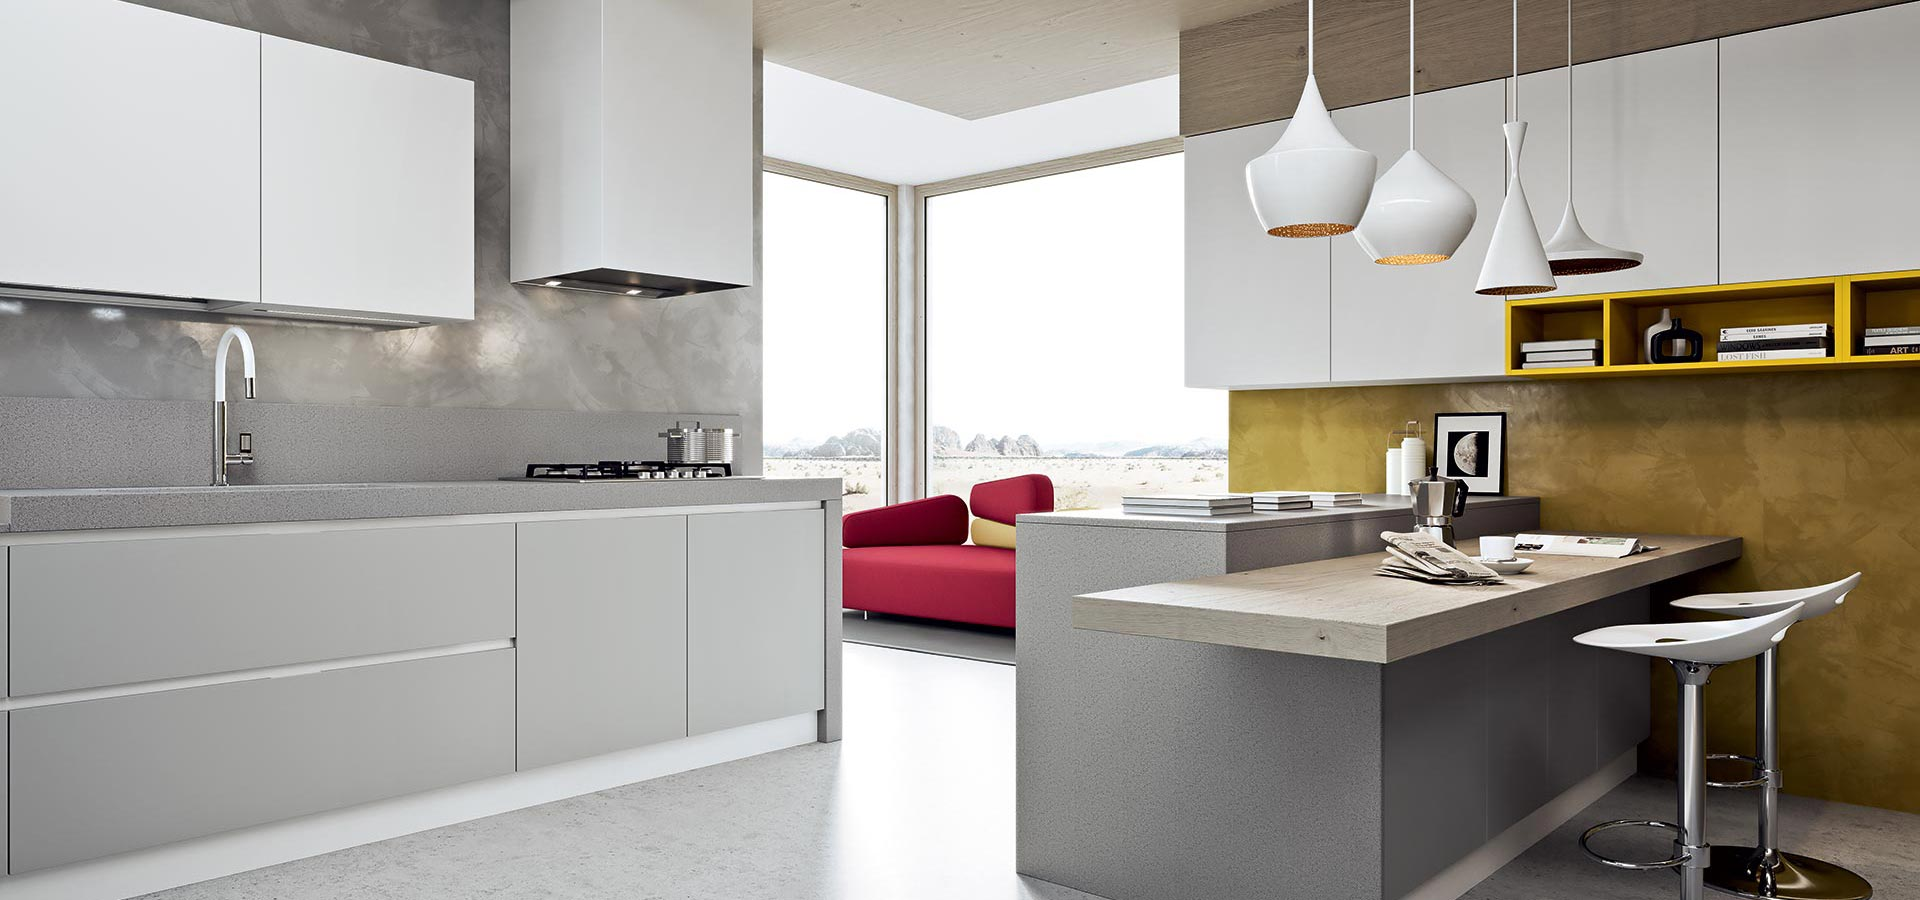 Arredamenti gallomobili mobili udine cucine moderne cucina luna - Cucine grigio perla ...